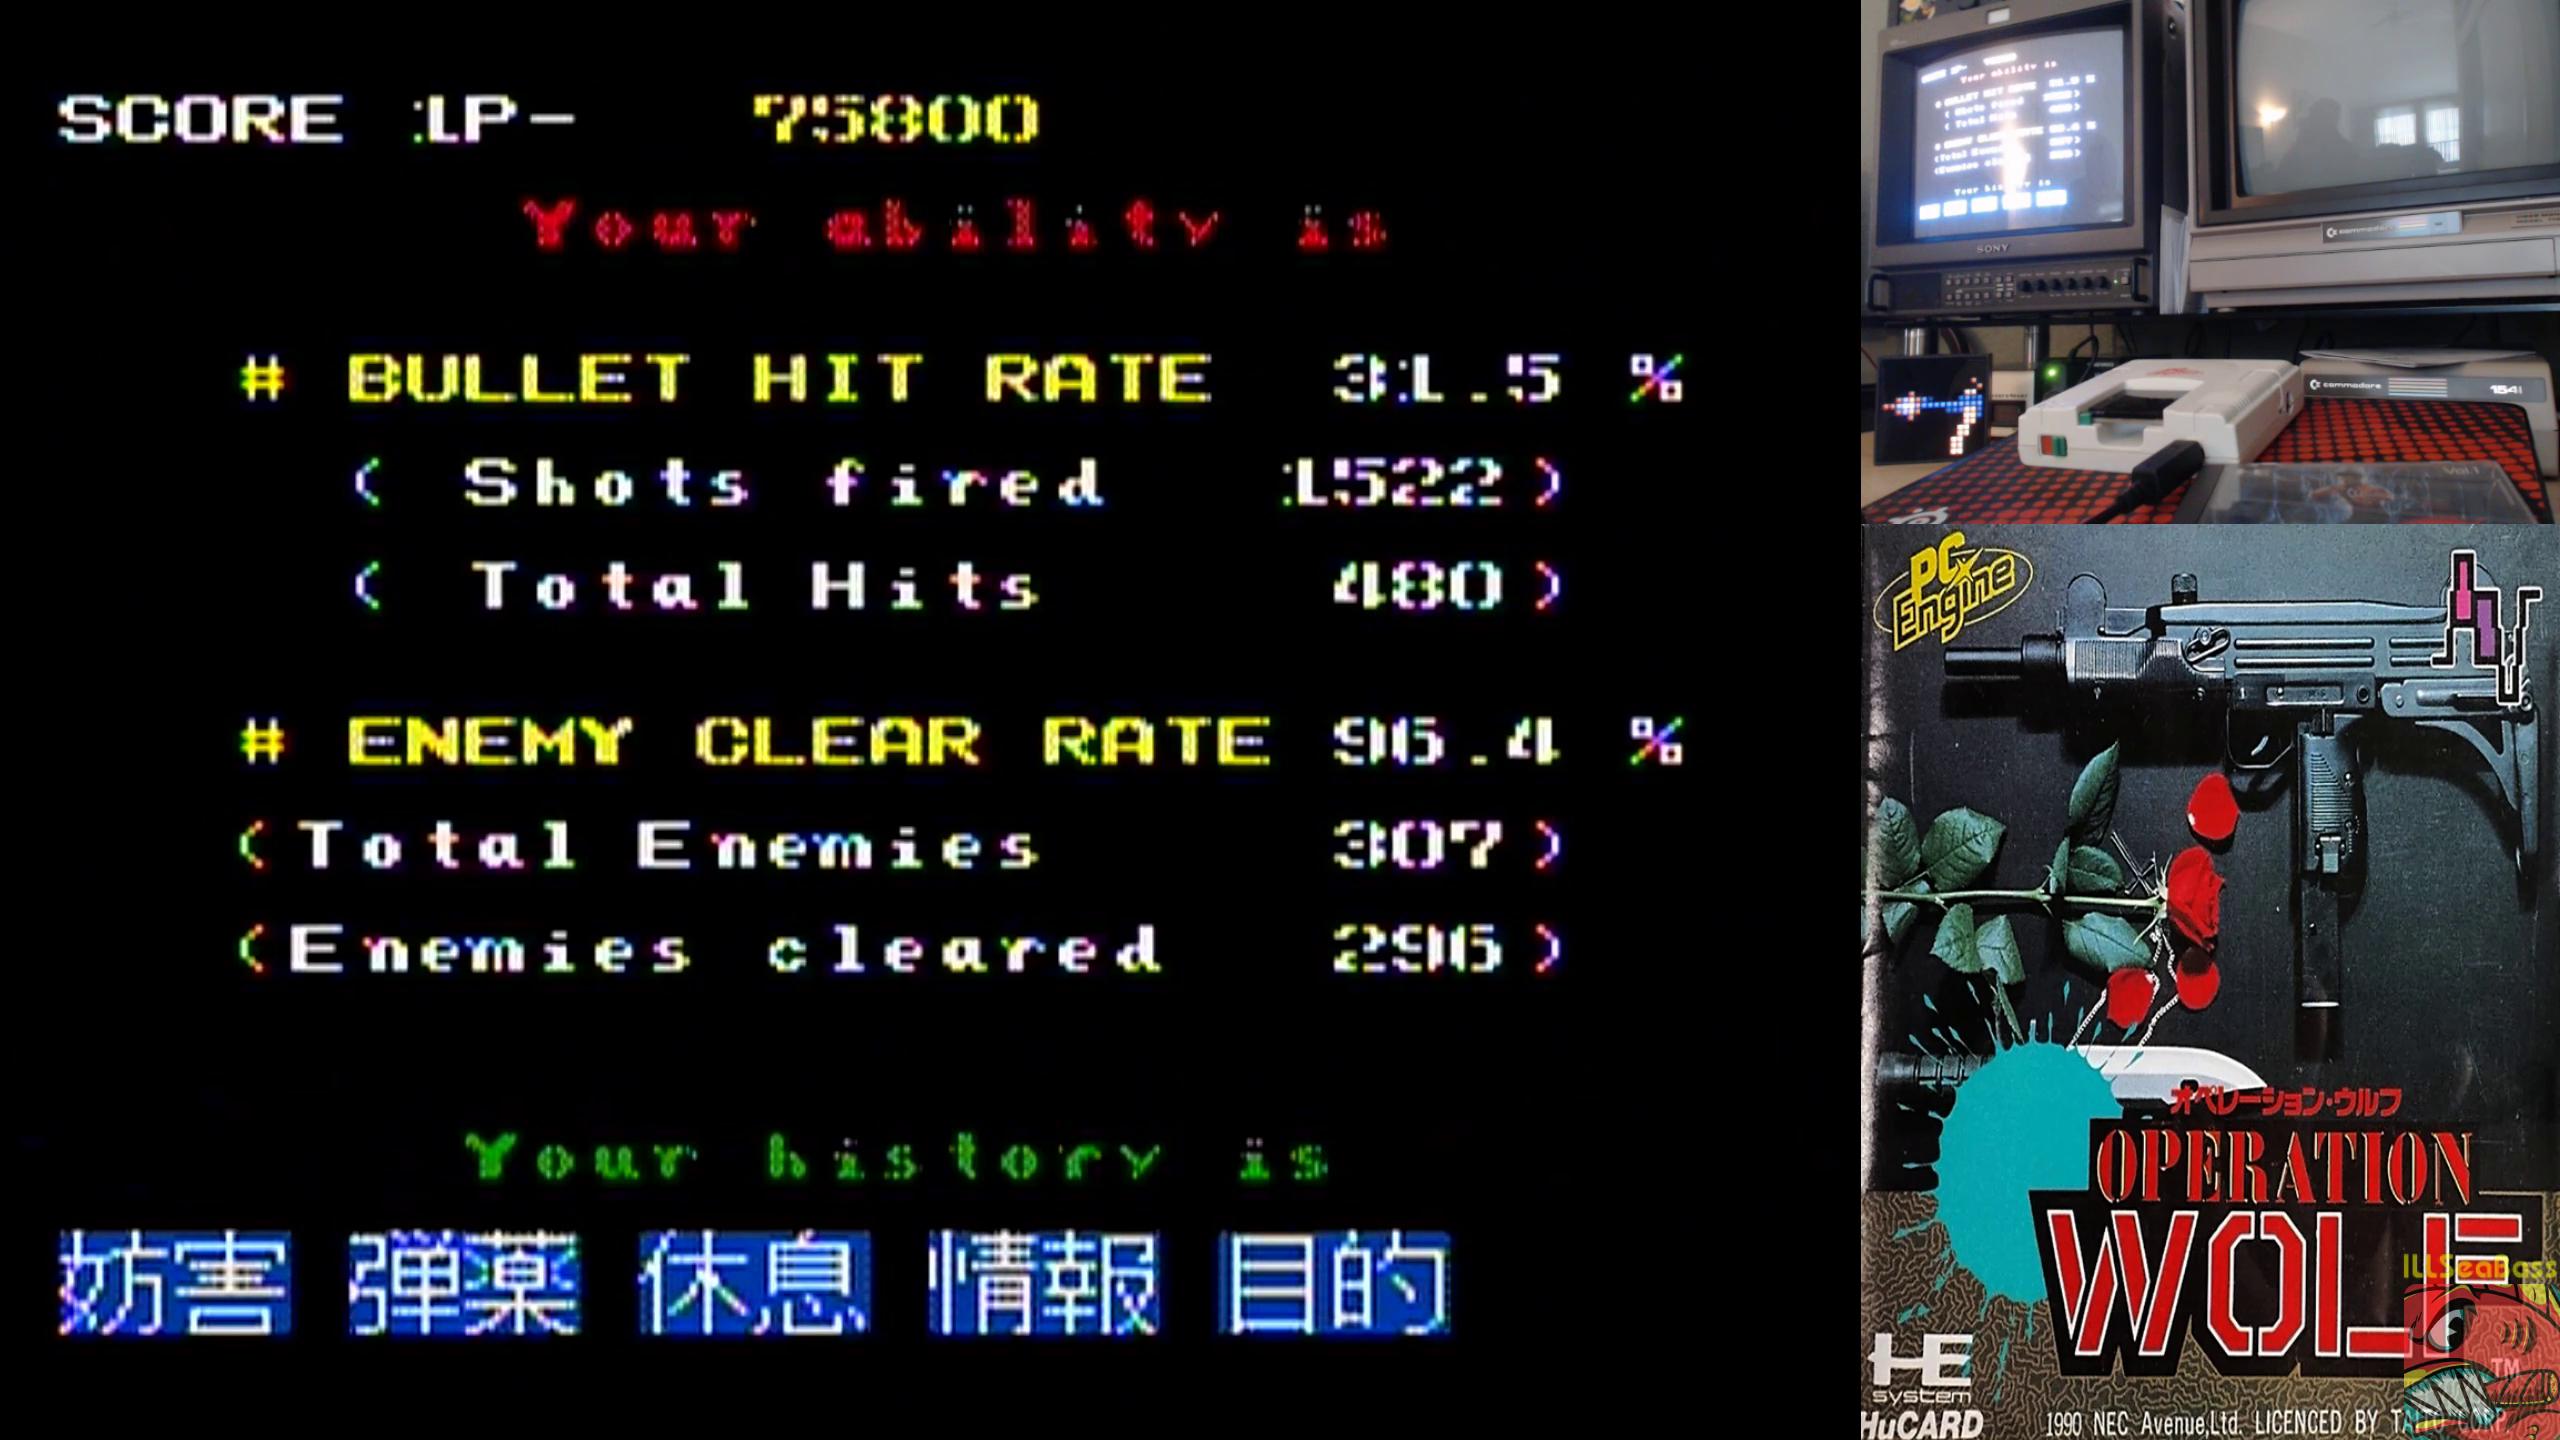 ILLSeaBass: Operation Wolf (TurboGrafx-16/PC Engine) 75,800 points on 2019-05-13 23:47:32